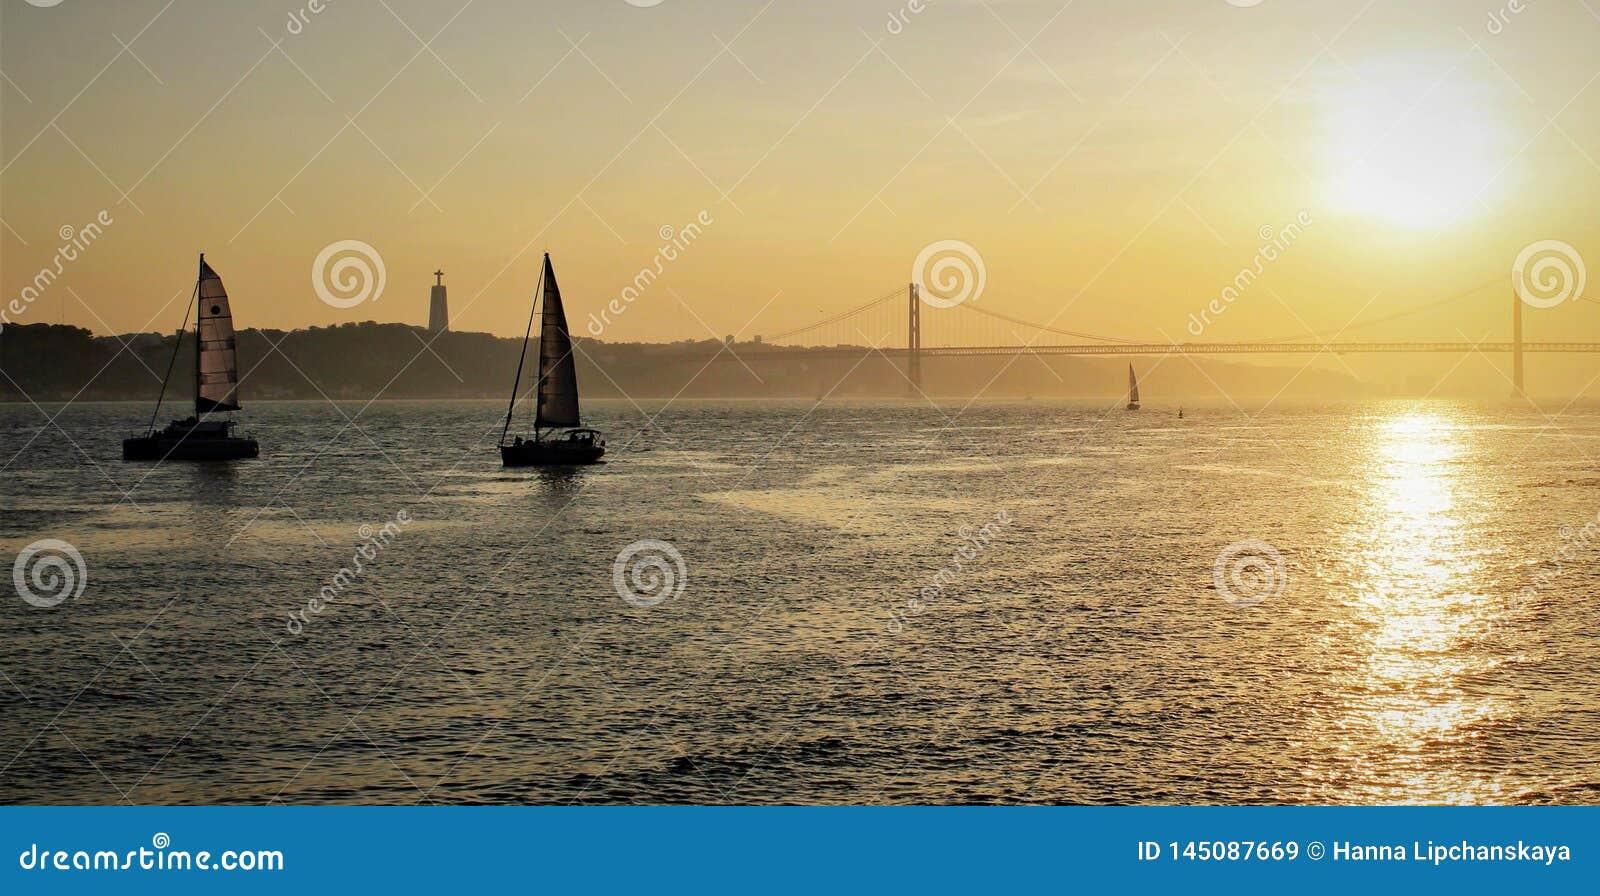 Sale boats sailing near the shores of Lisbon